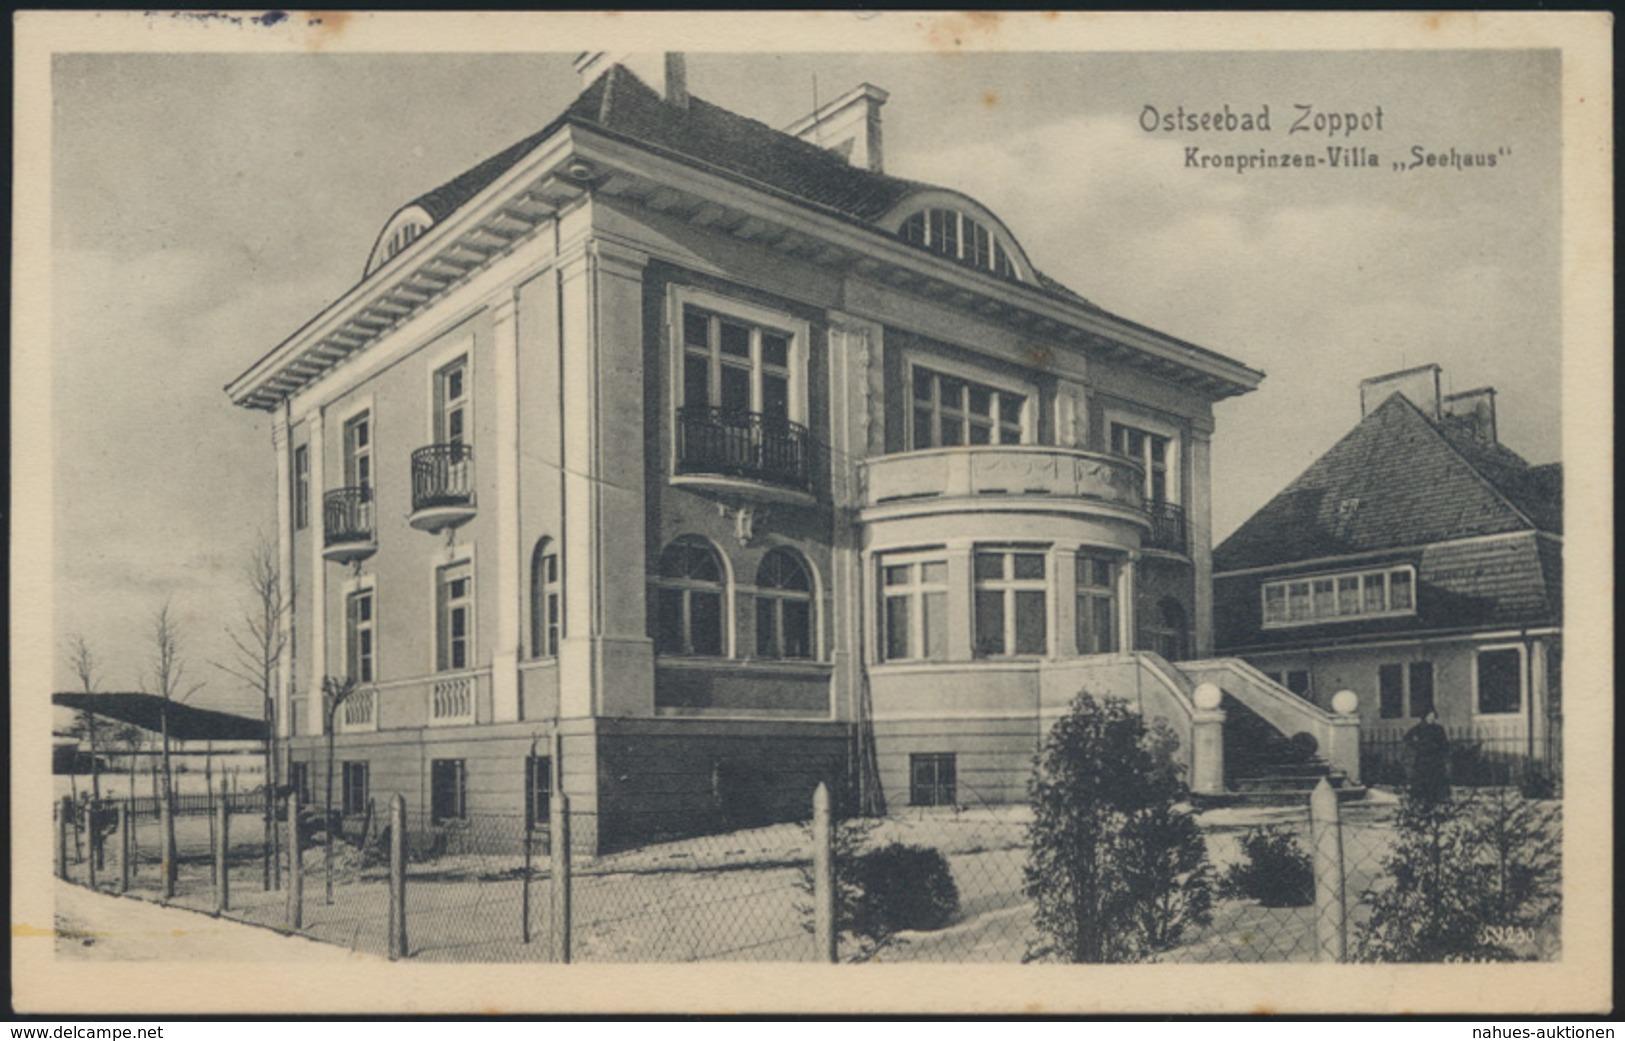 Ansichtskarte Danzig Zoppot Ostsee Kronprinzen Villa Seehaus N. Altona Ottensen - Danzig